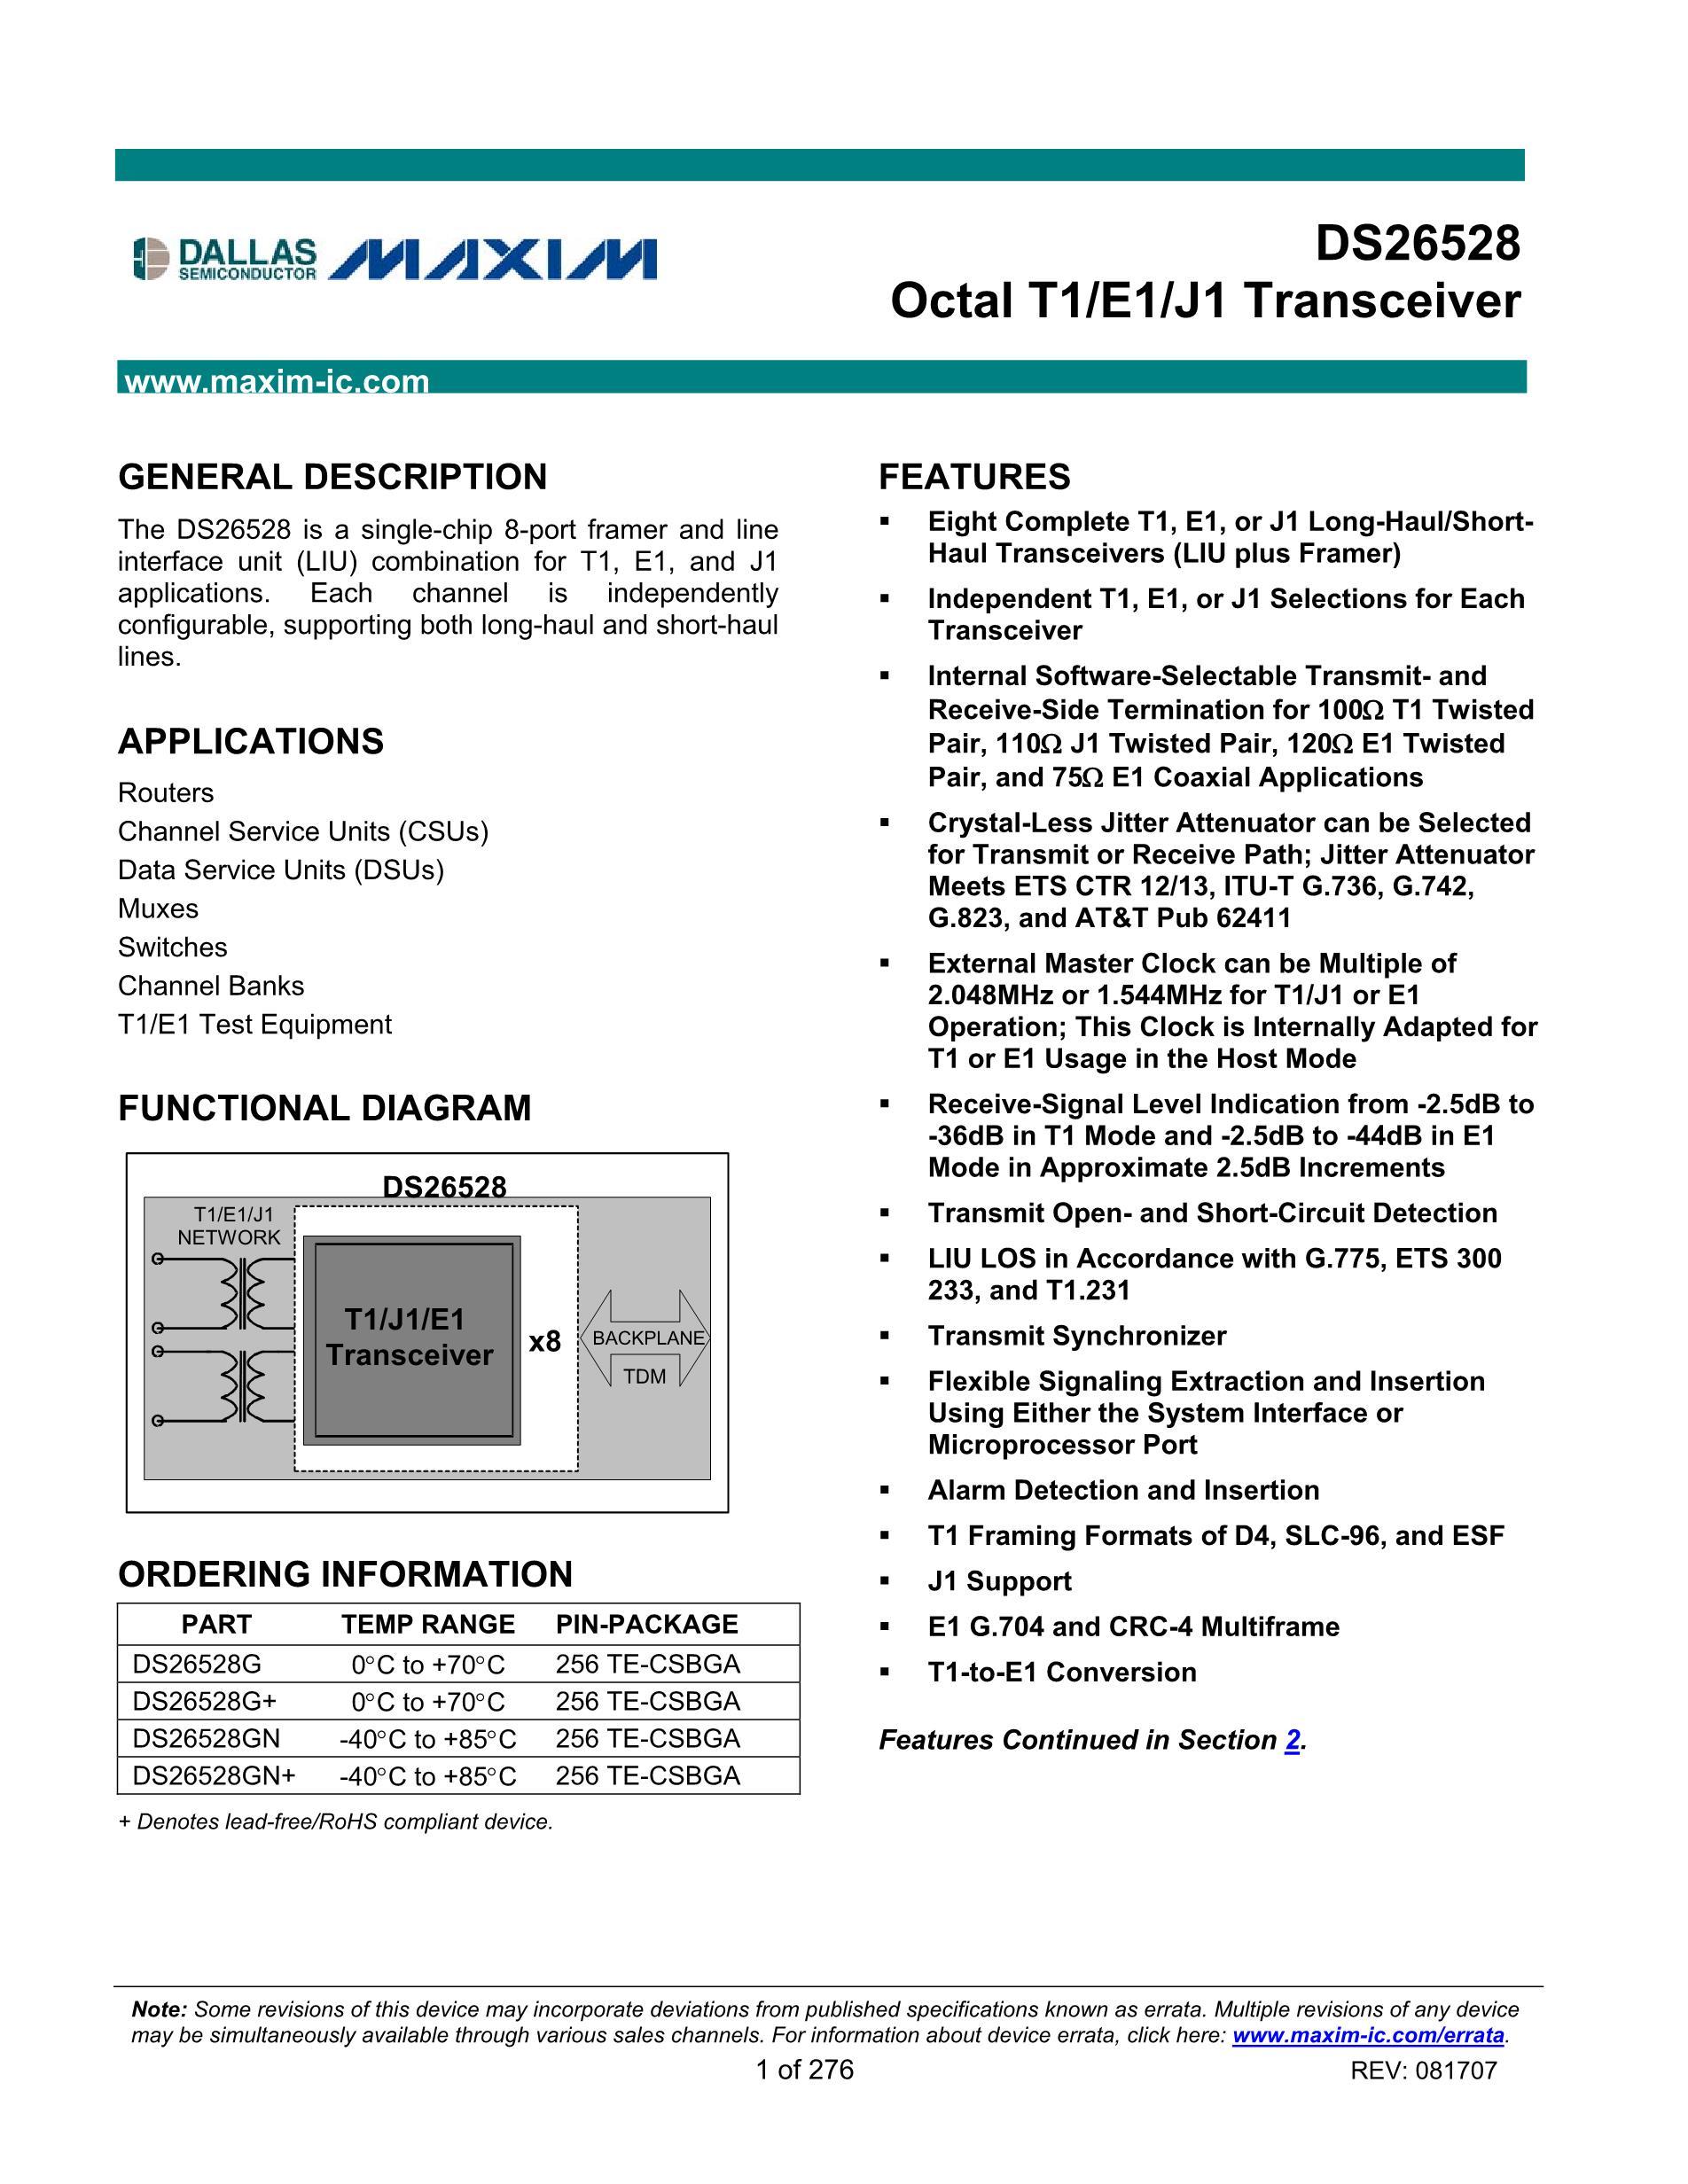 DS26LS31CM 's pdf picture 1